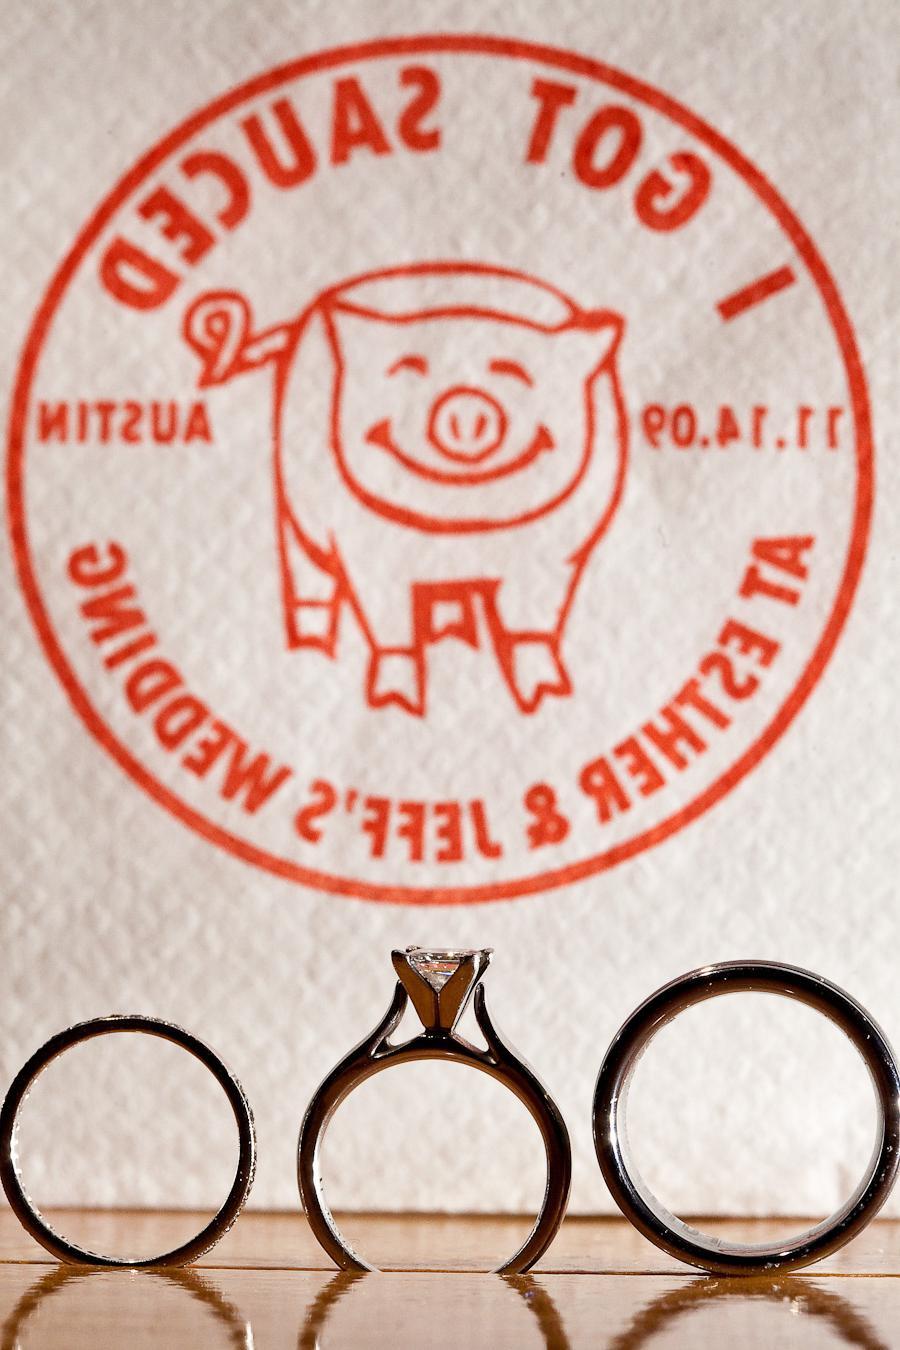 awesome napkins!! classic